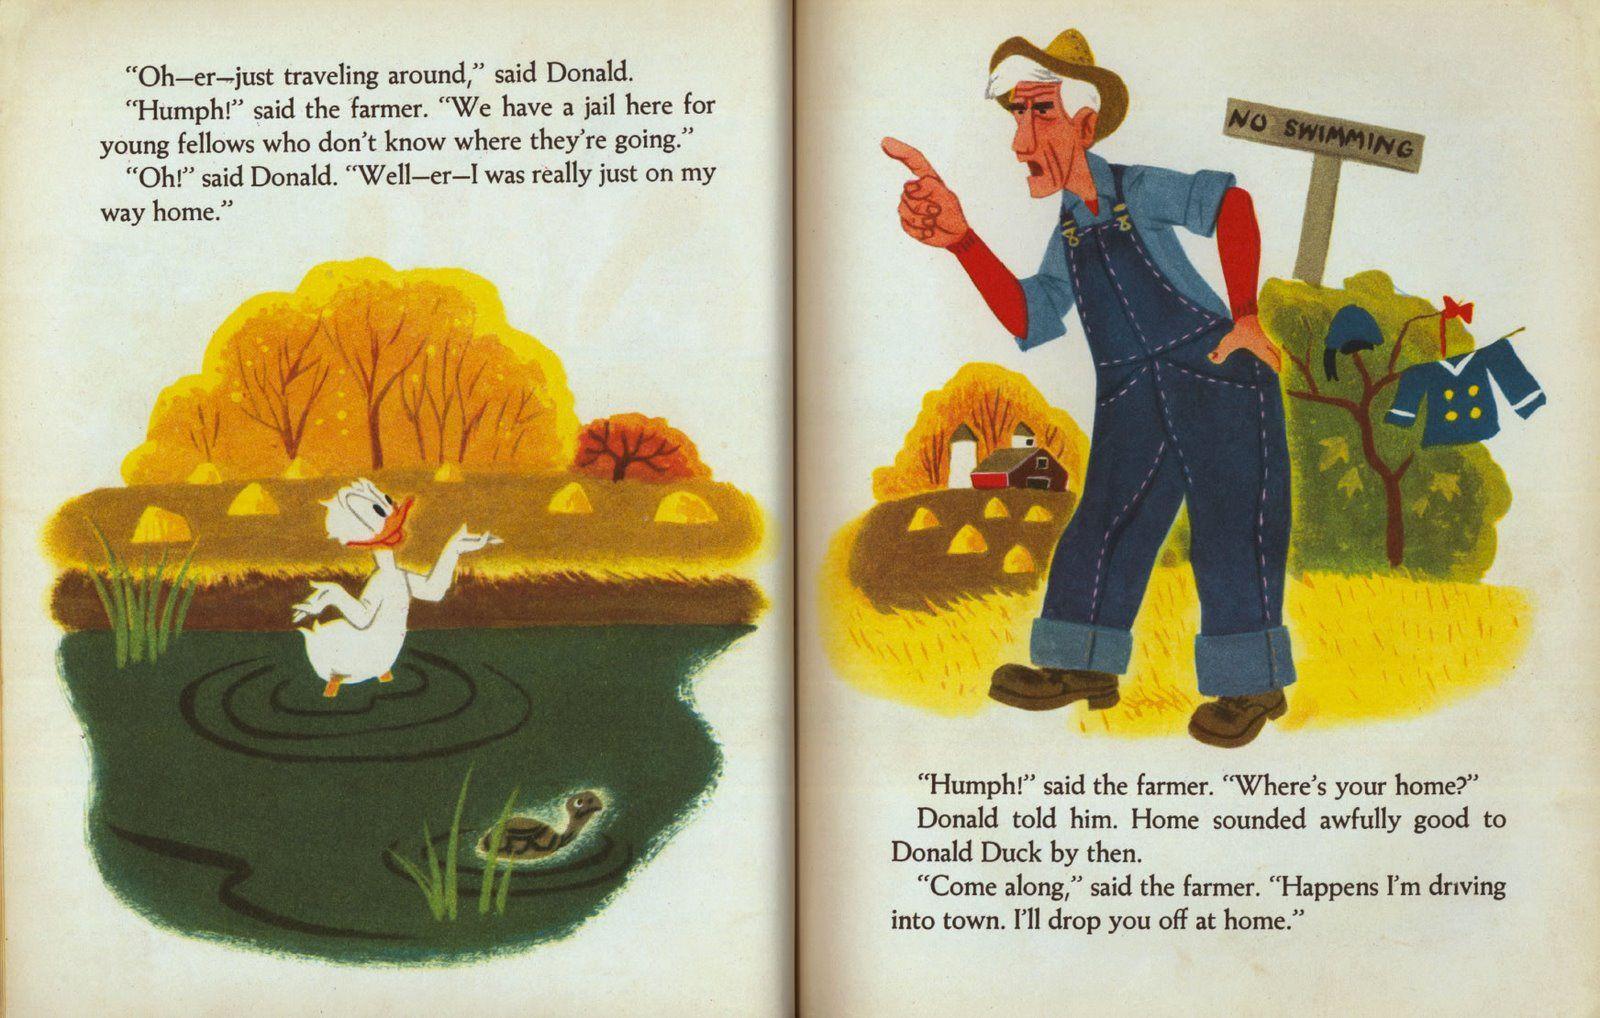 Donald ducks adventure illustrated by walt disney studio